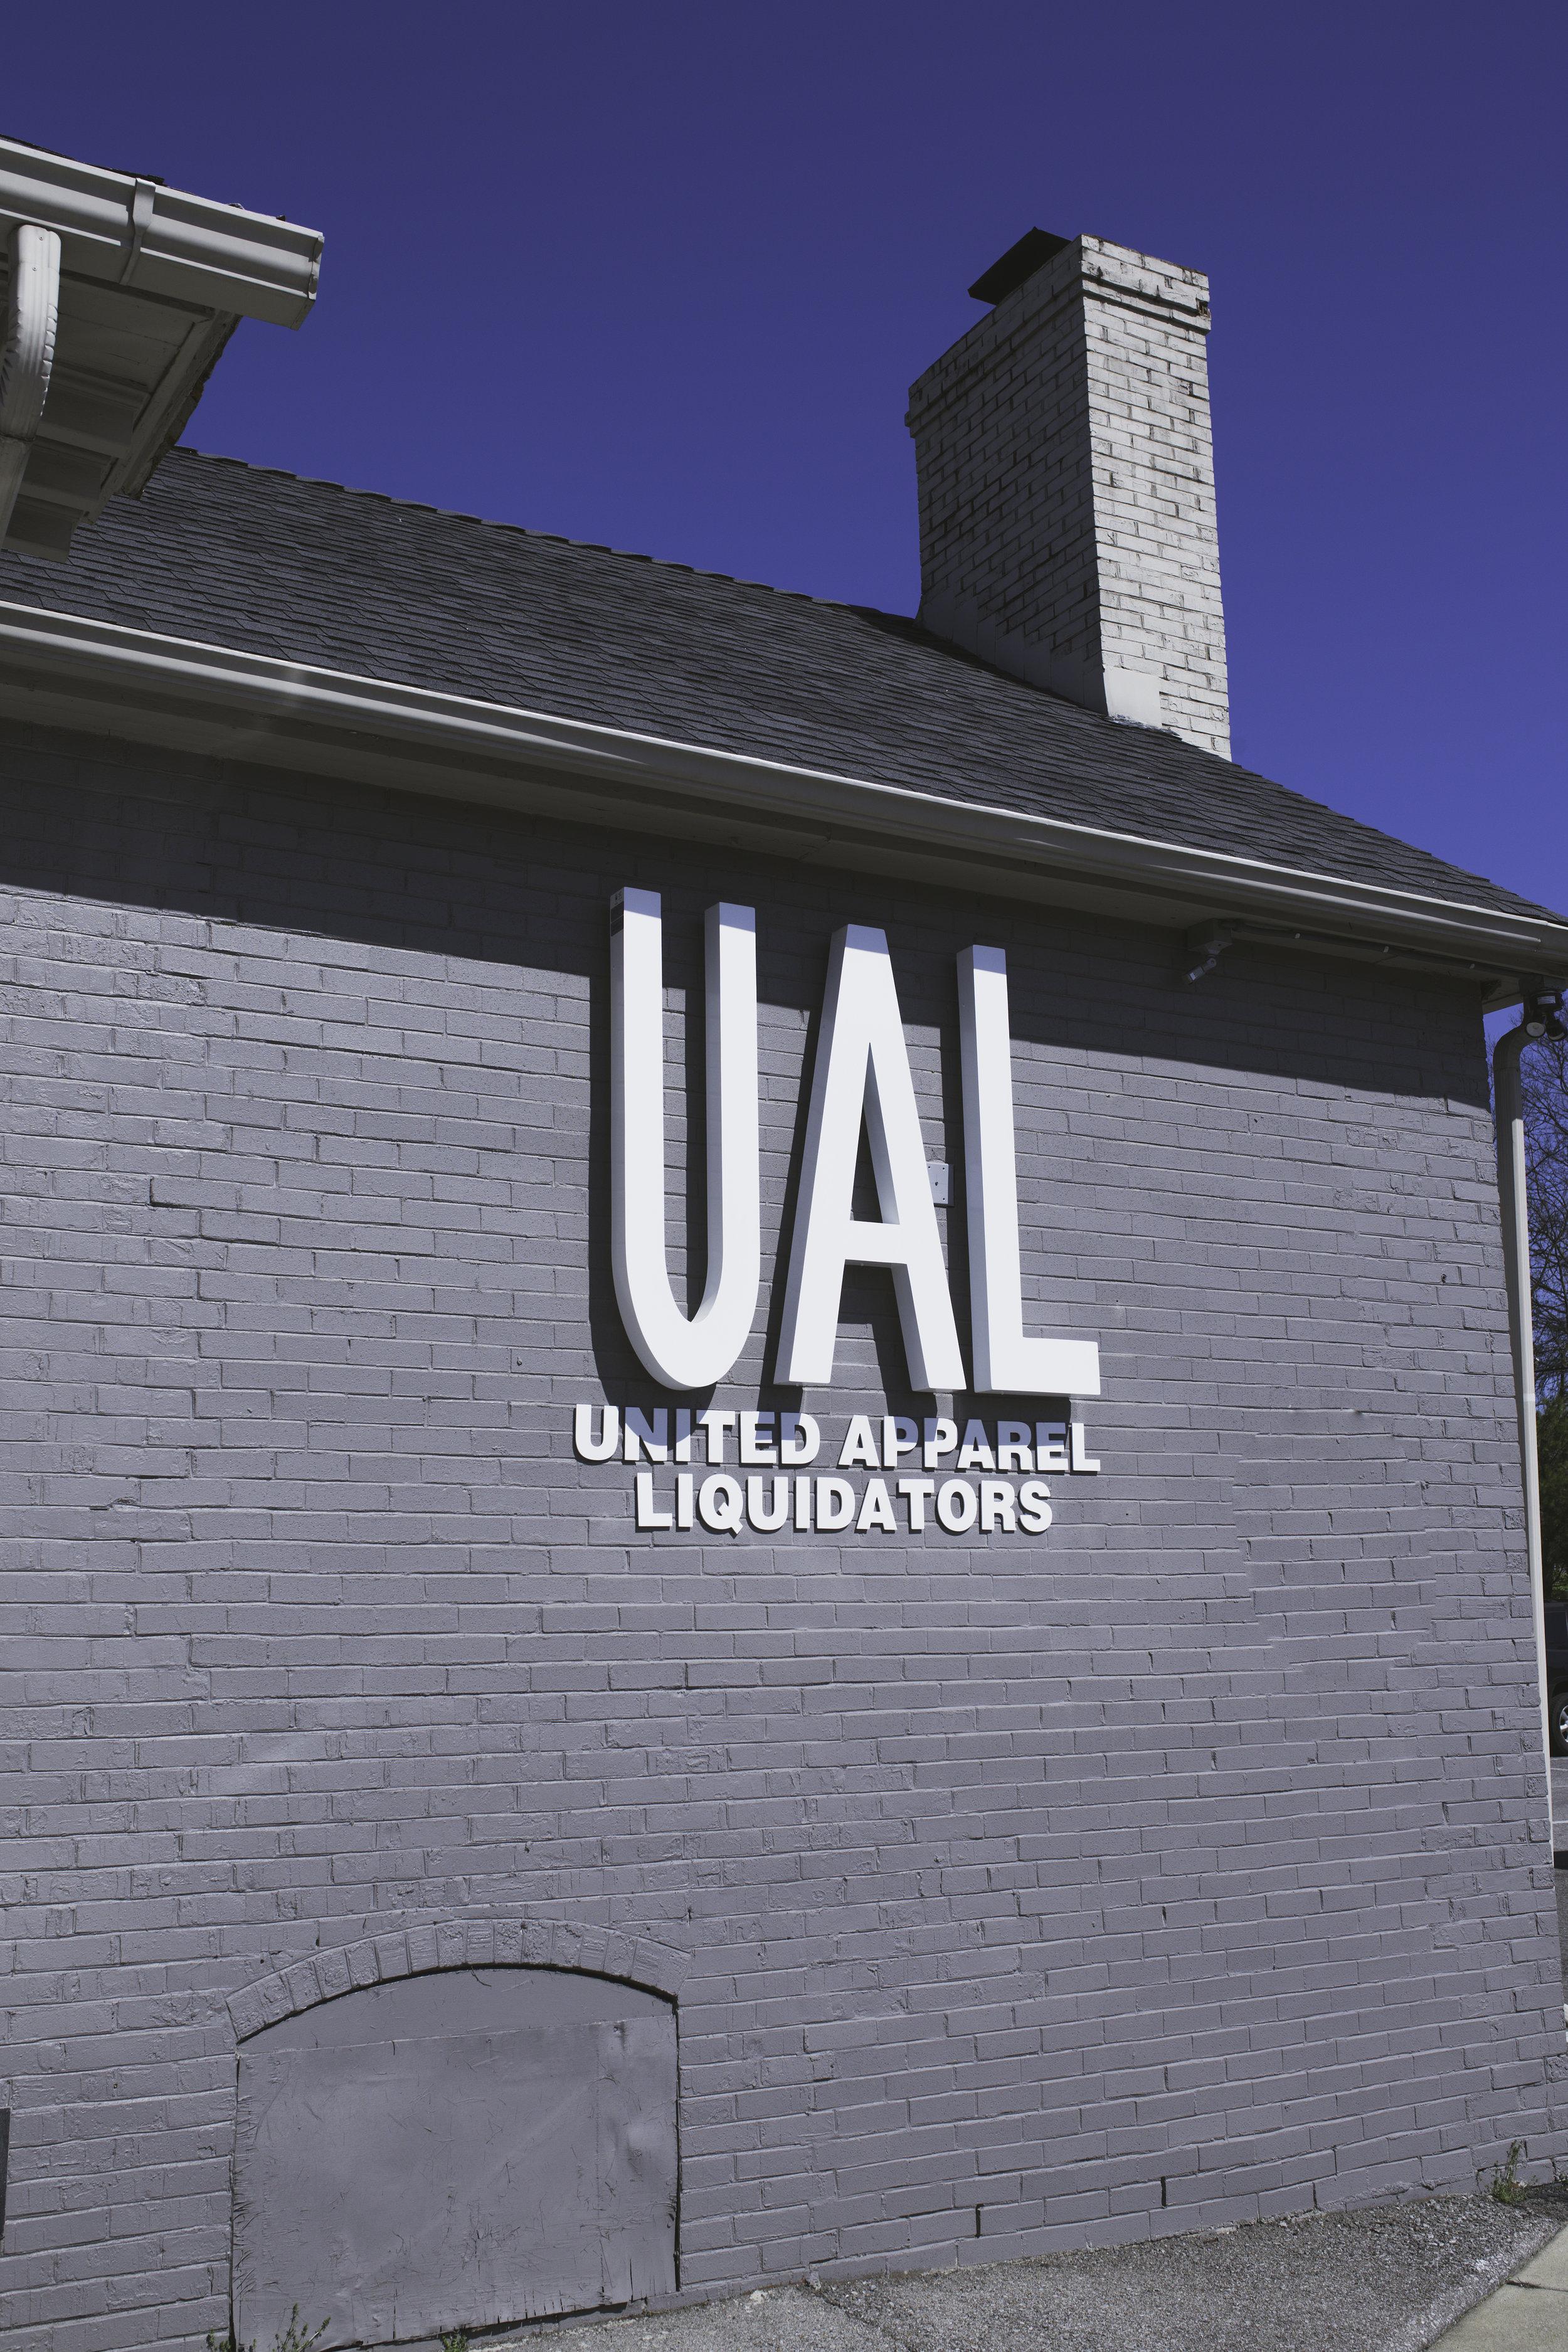 ual2.jpg